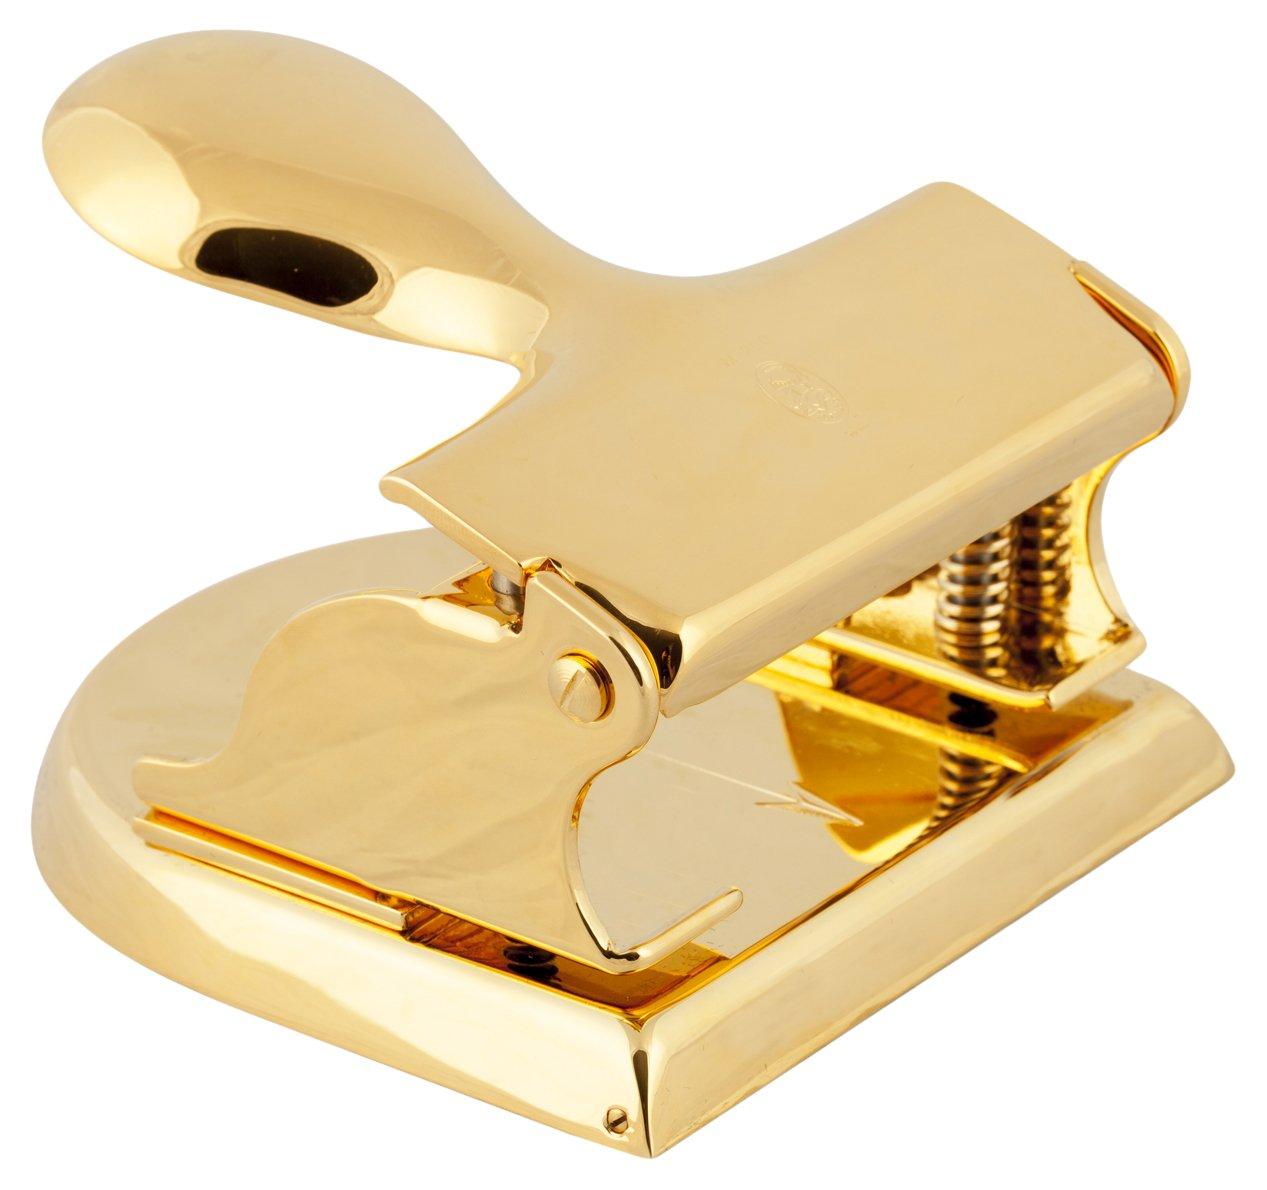 El Casco M-200 2 Hole Punch (Gold) by El Casco (Image #1)